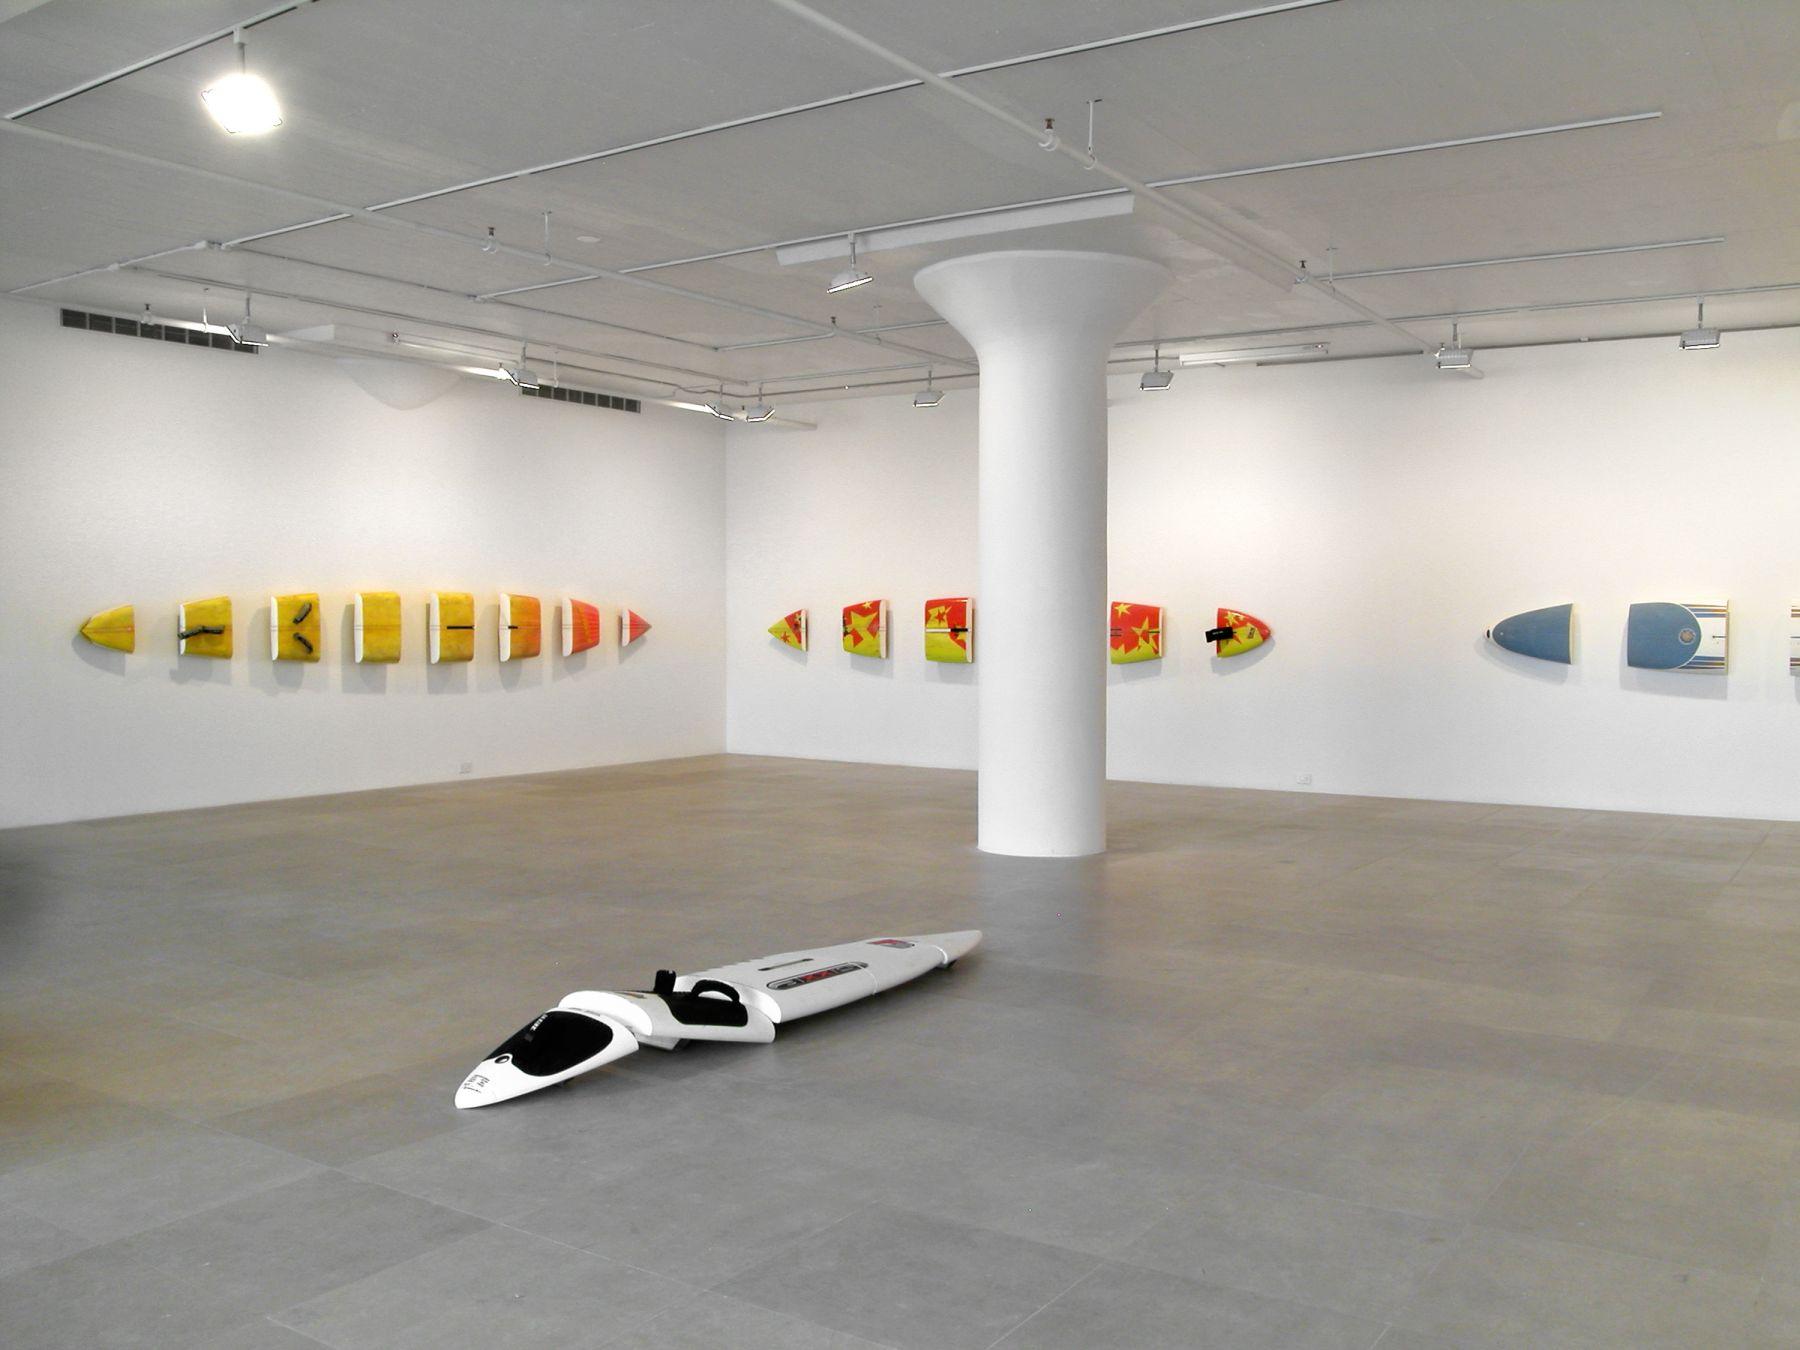 Michael Krebber, Installation view, Greene Naftali, New York, 2008